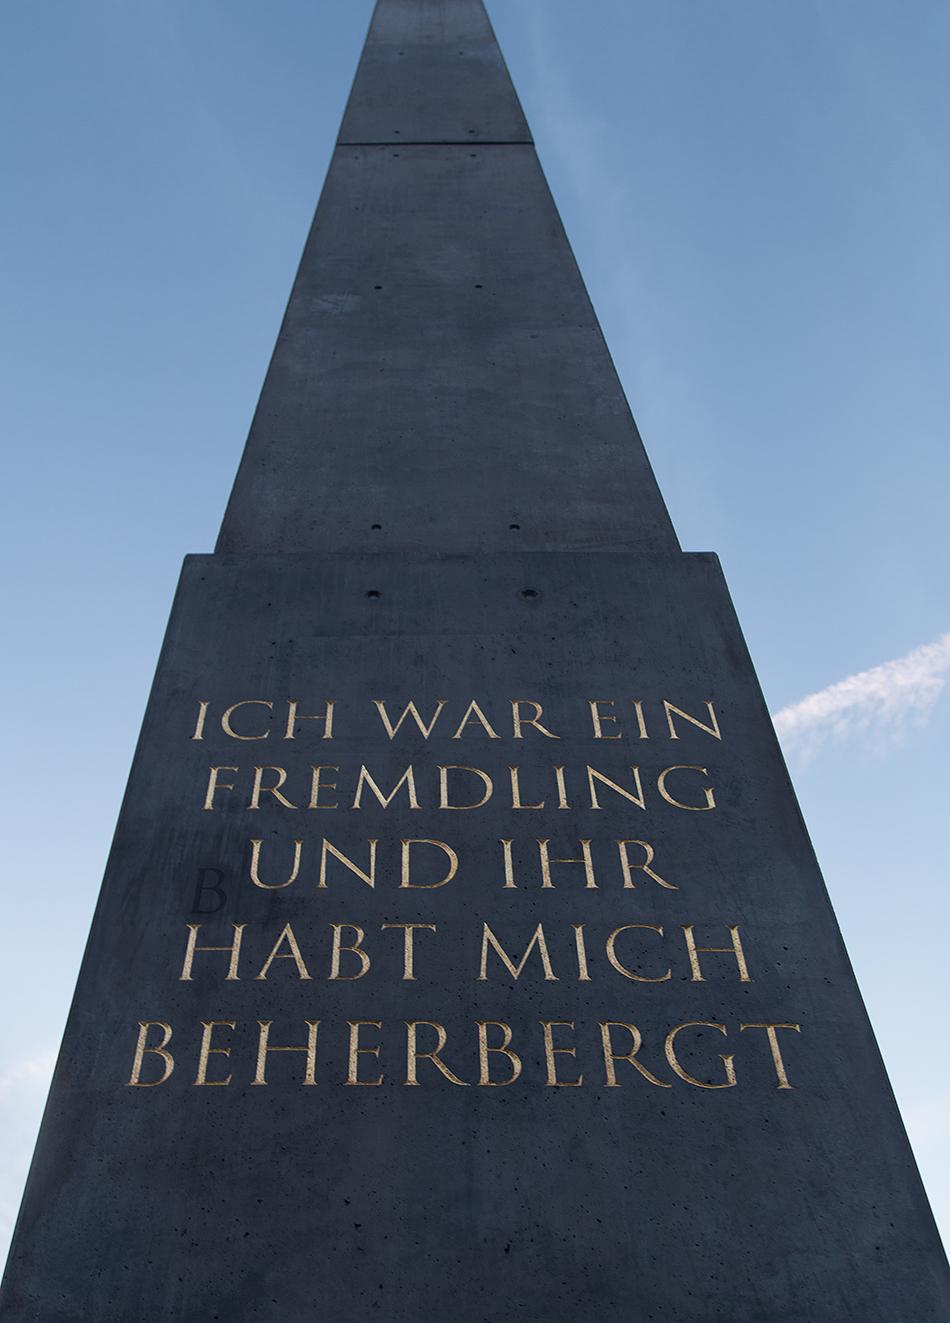 Fabian Fröhlich, documenta 14, Kassel, Olu Oguibe, Das Fremdlinge und Flüchtlinge Monument  (Königsplatz)